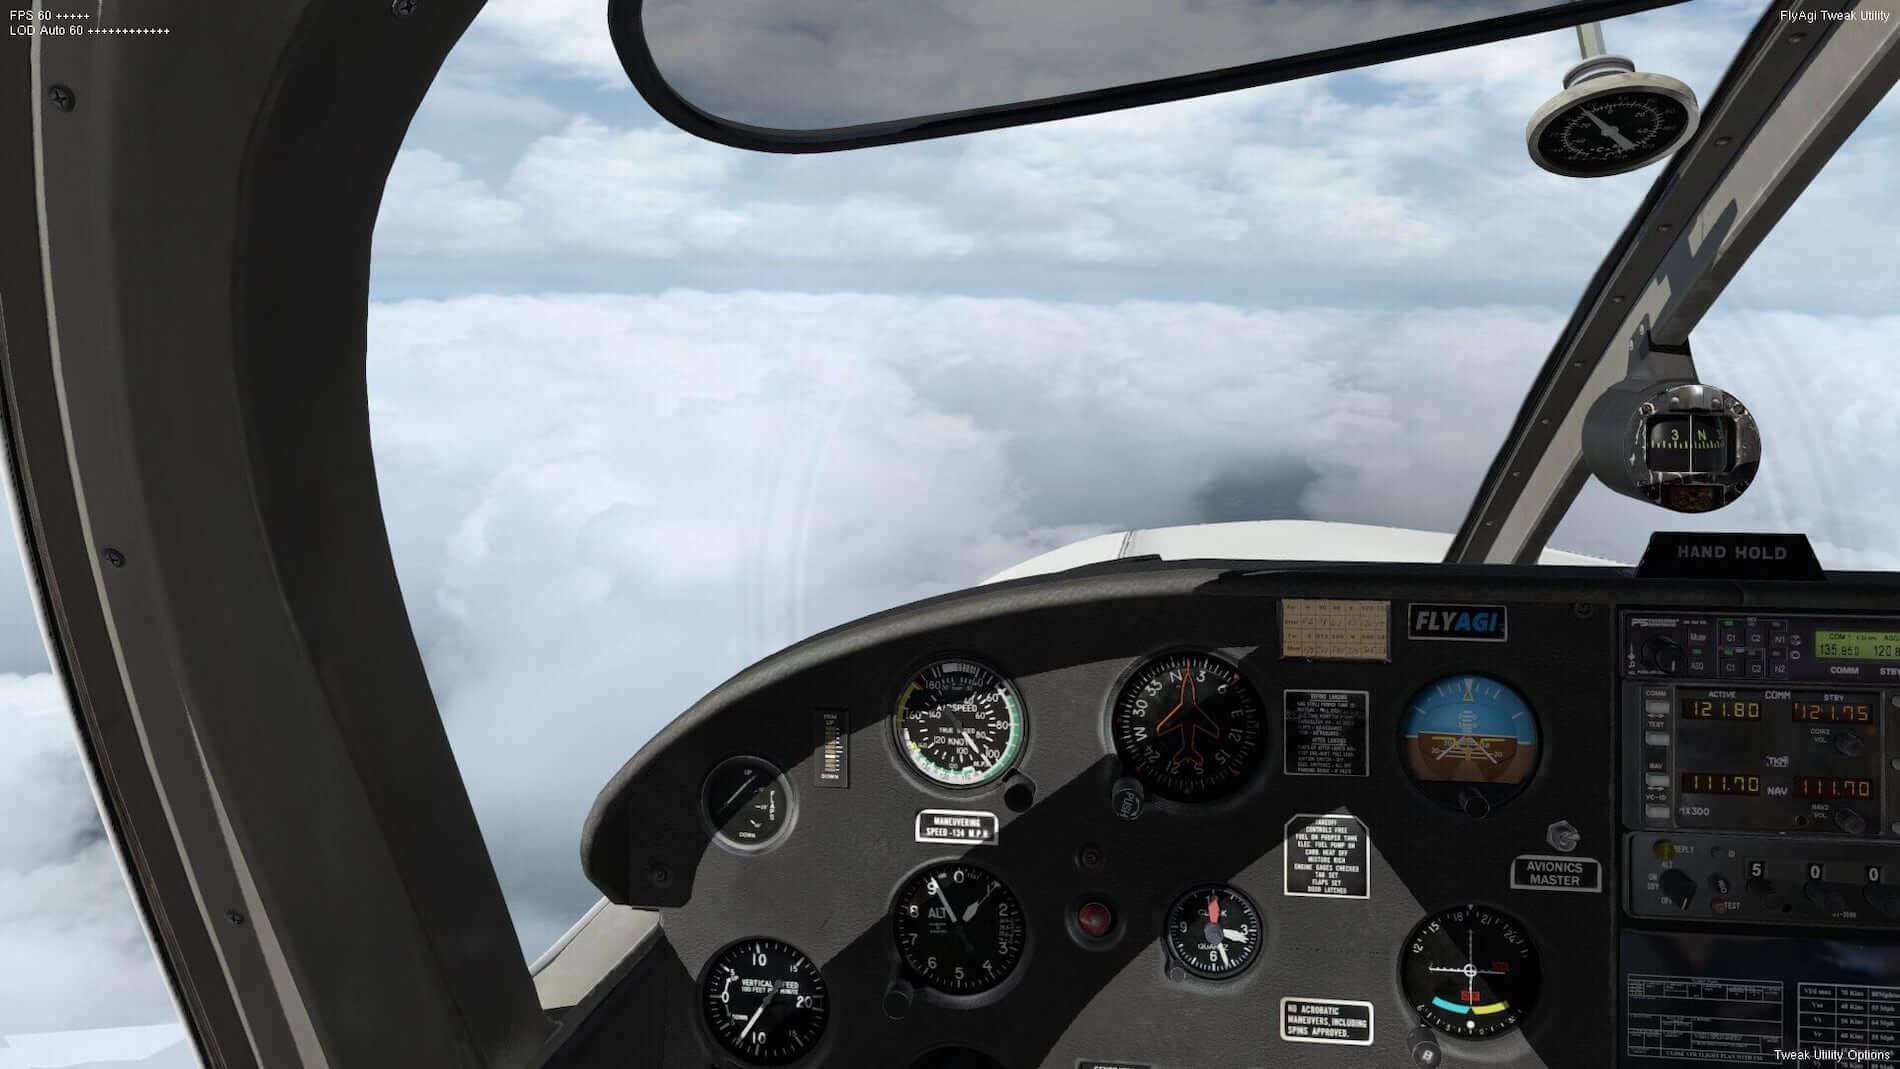 FlyAGI-FTU-Weather-System-ASXP-21